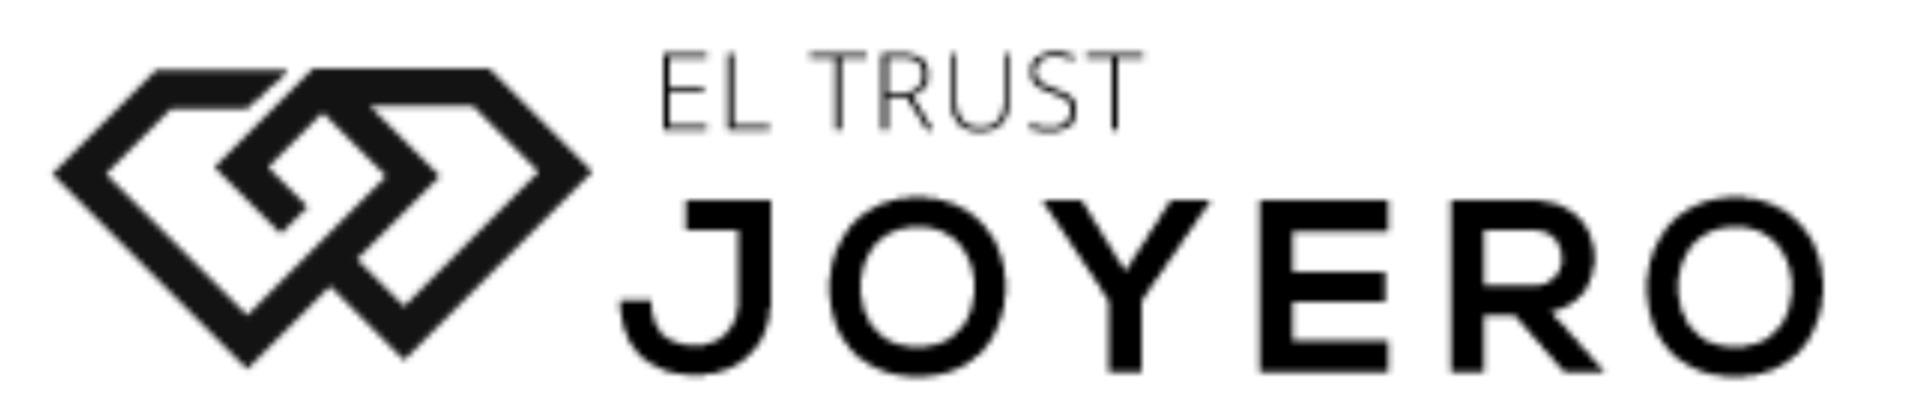 ELTRUST JOYERO